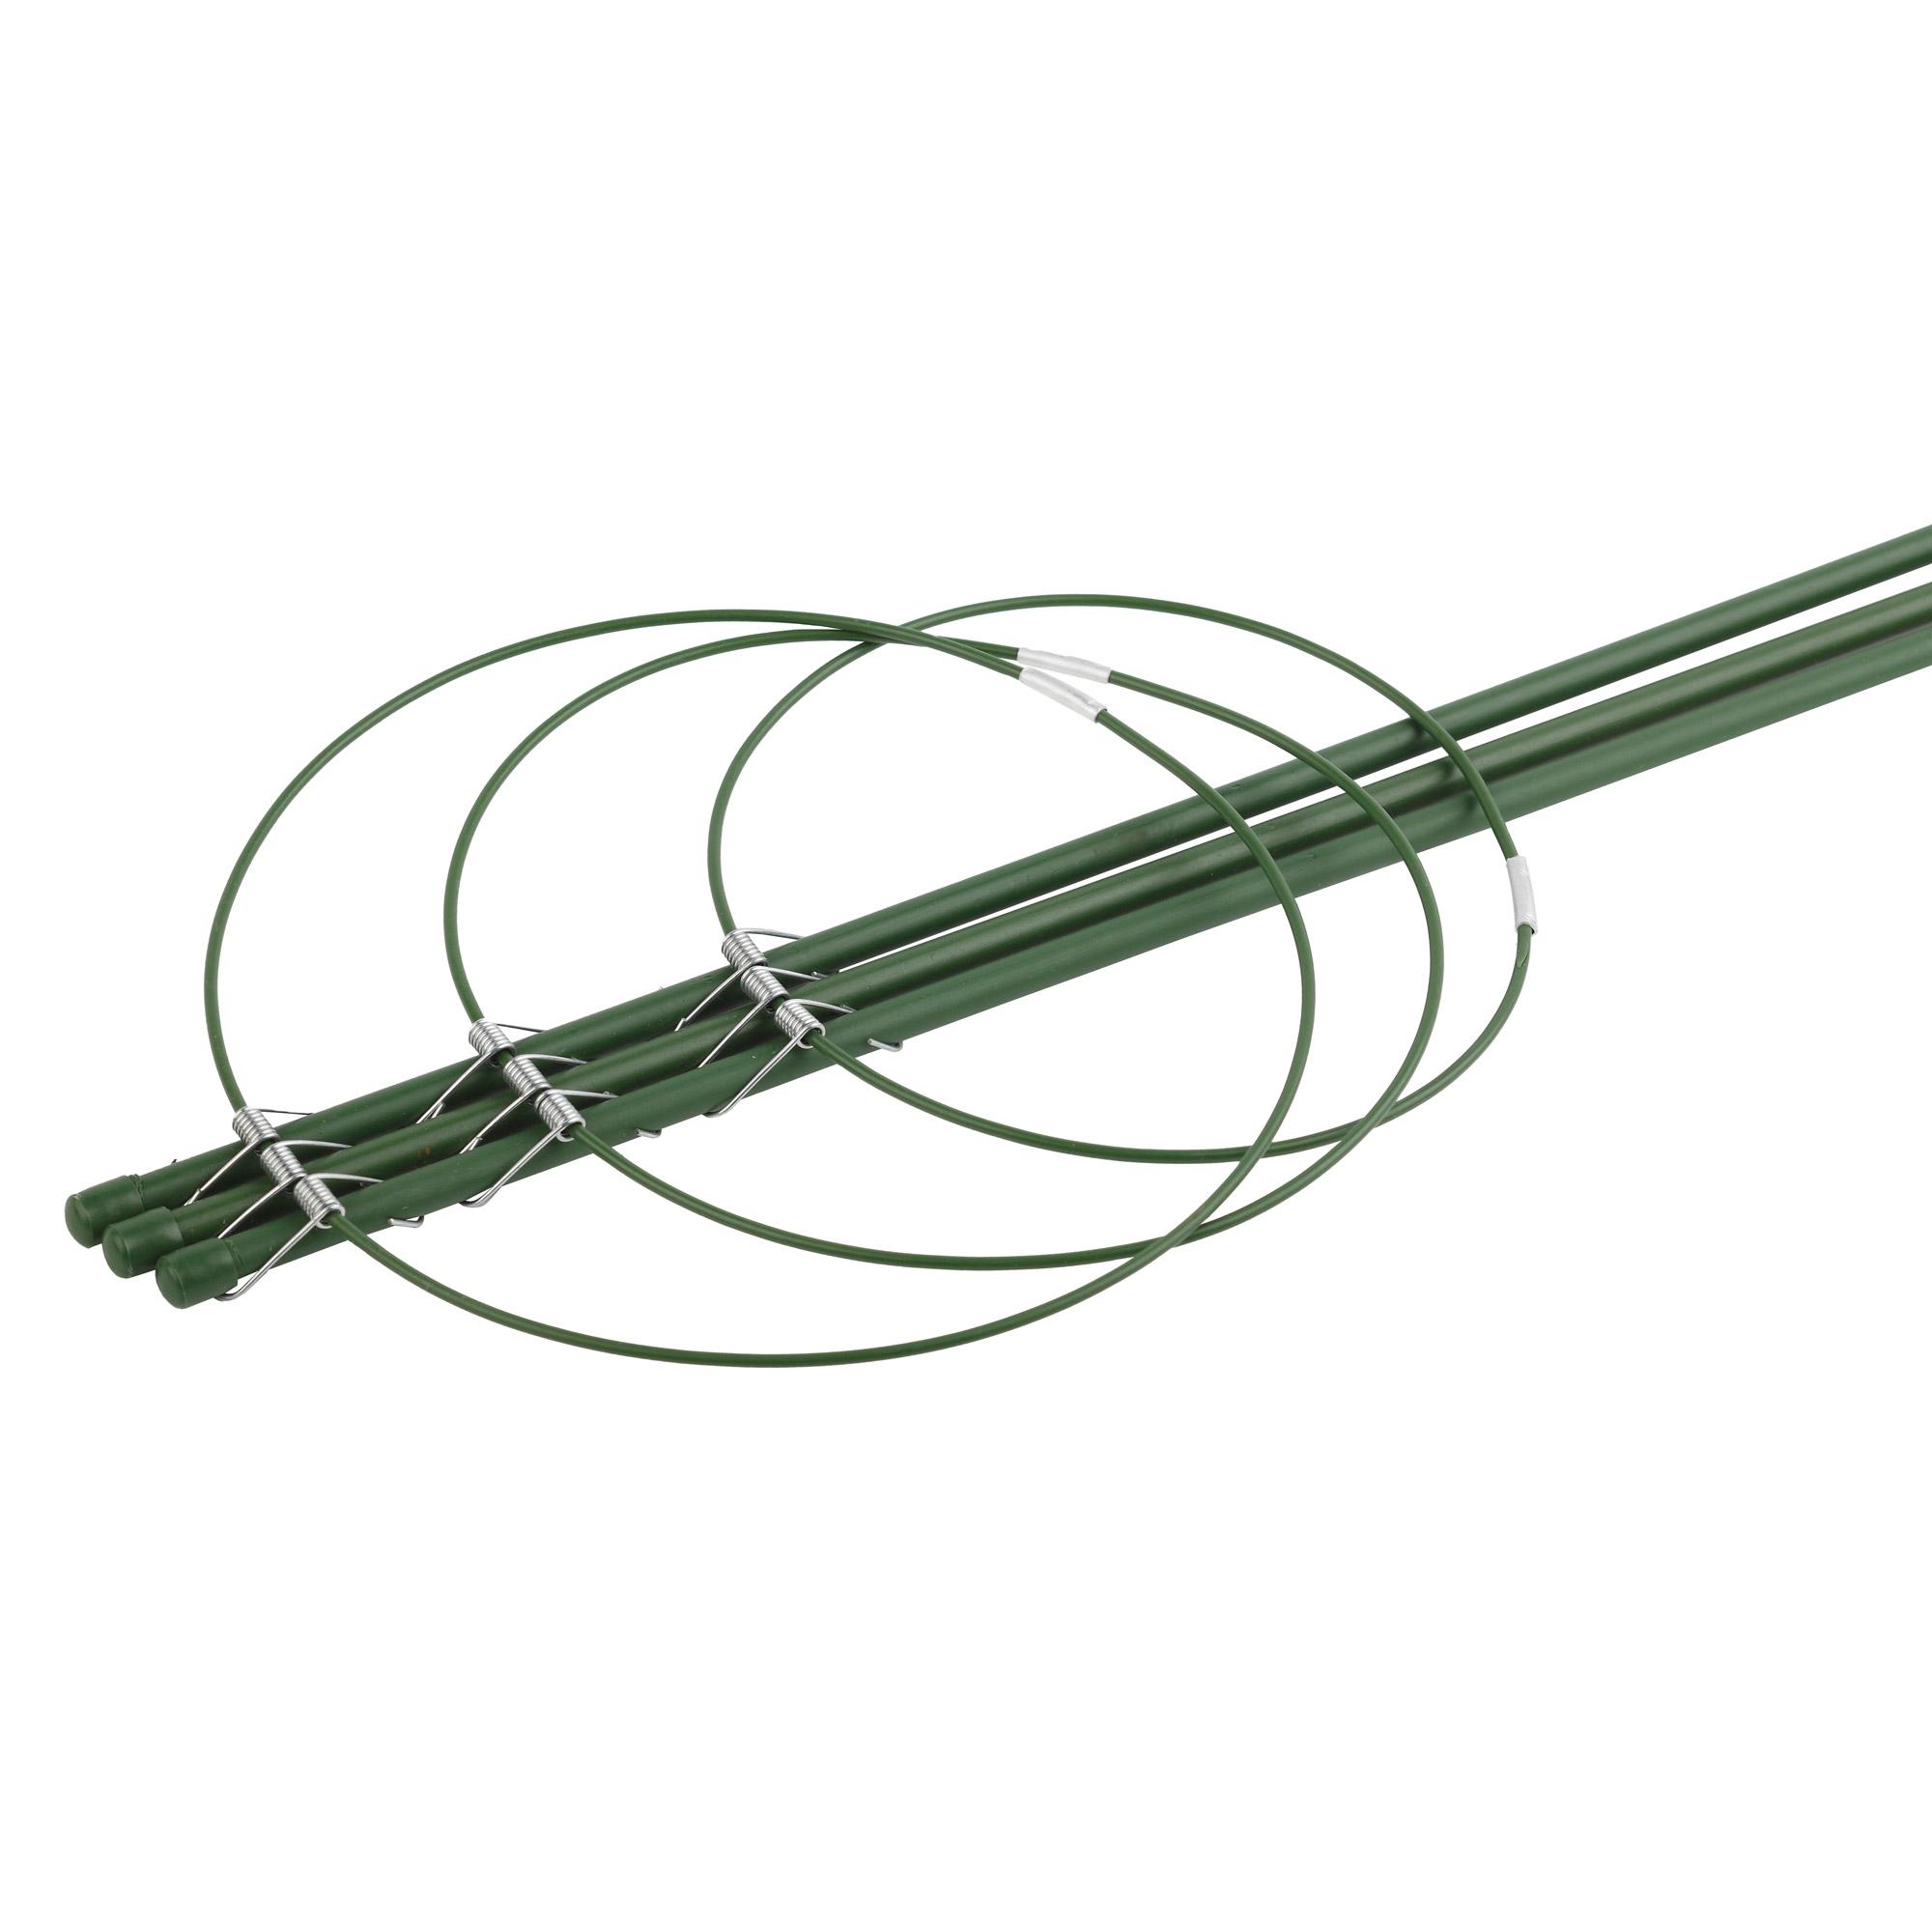 Поддержка Green apple GFS-3-45 для цветов 3 кольца 45 см стул подколенник green apple gast04 06 60x26х49 см